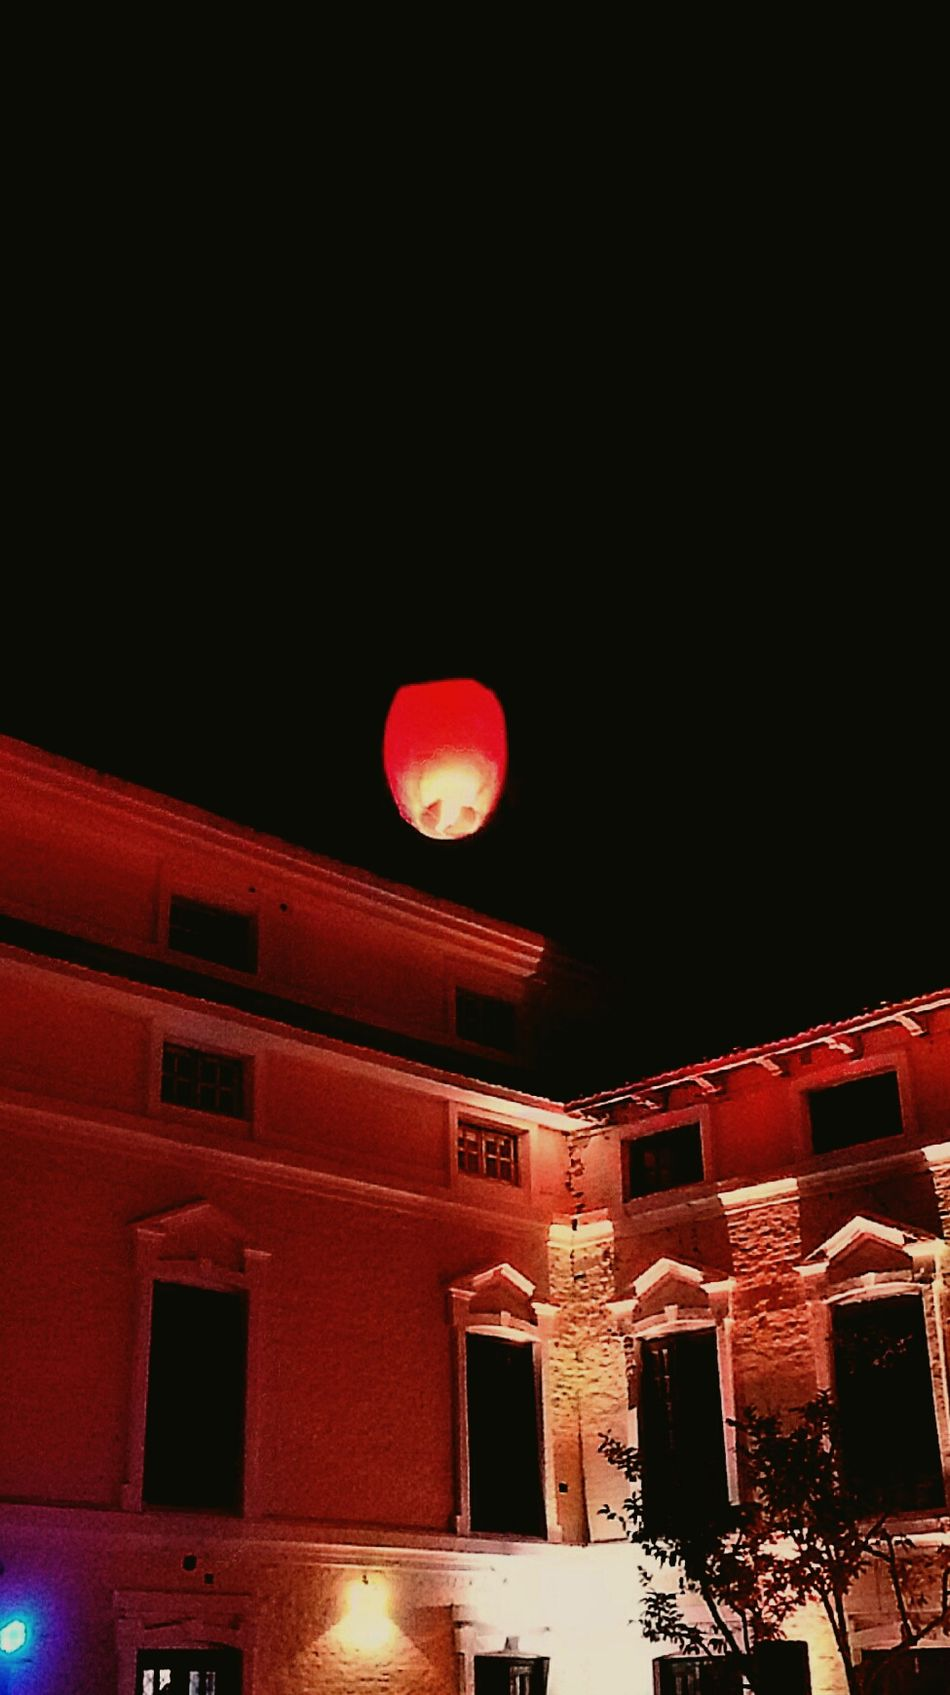 Night lights..Night Lights Hot Air Candles Enjoying Life Night Sky Flying Lanterns Chinese Lanterns Fun And Happiness Showcase: February